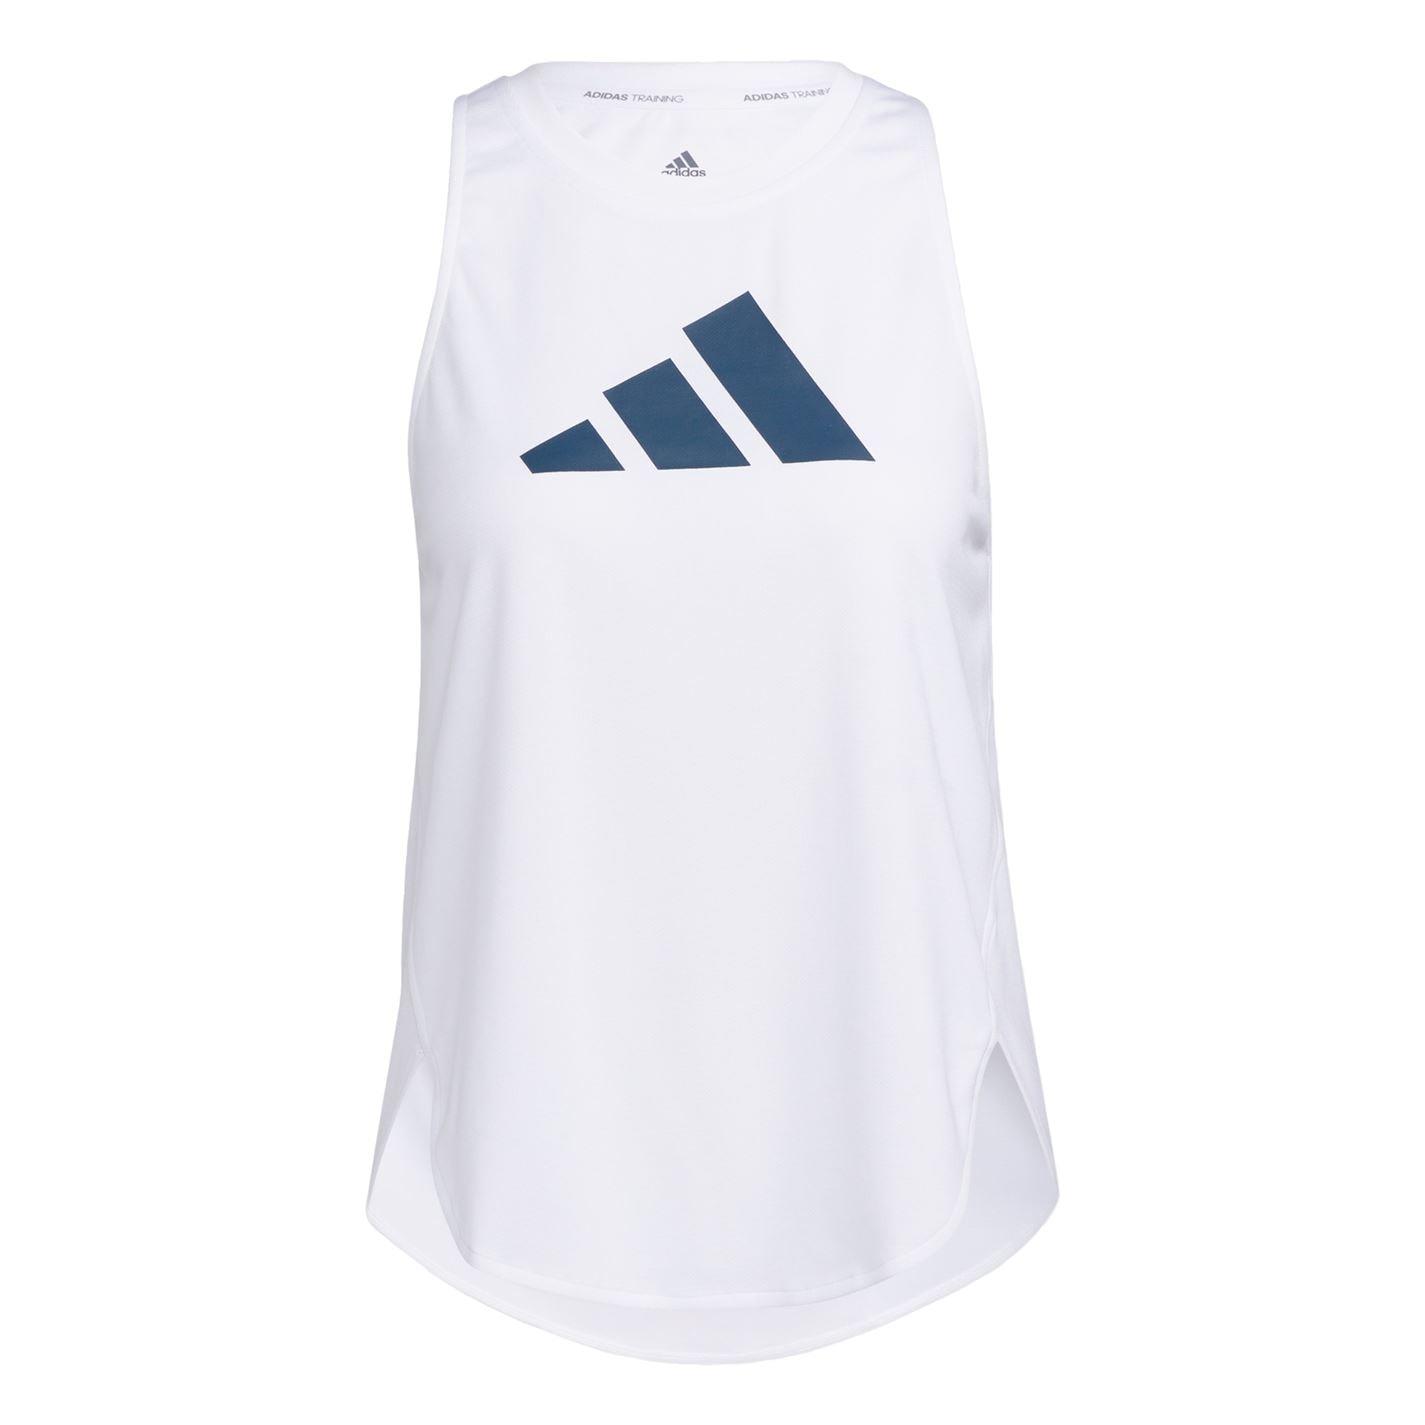 Adidas 3 Bar Logo Tank Top female